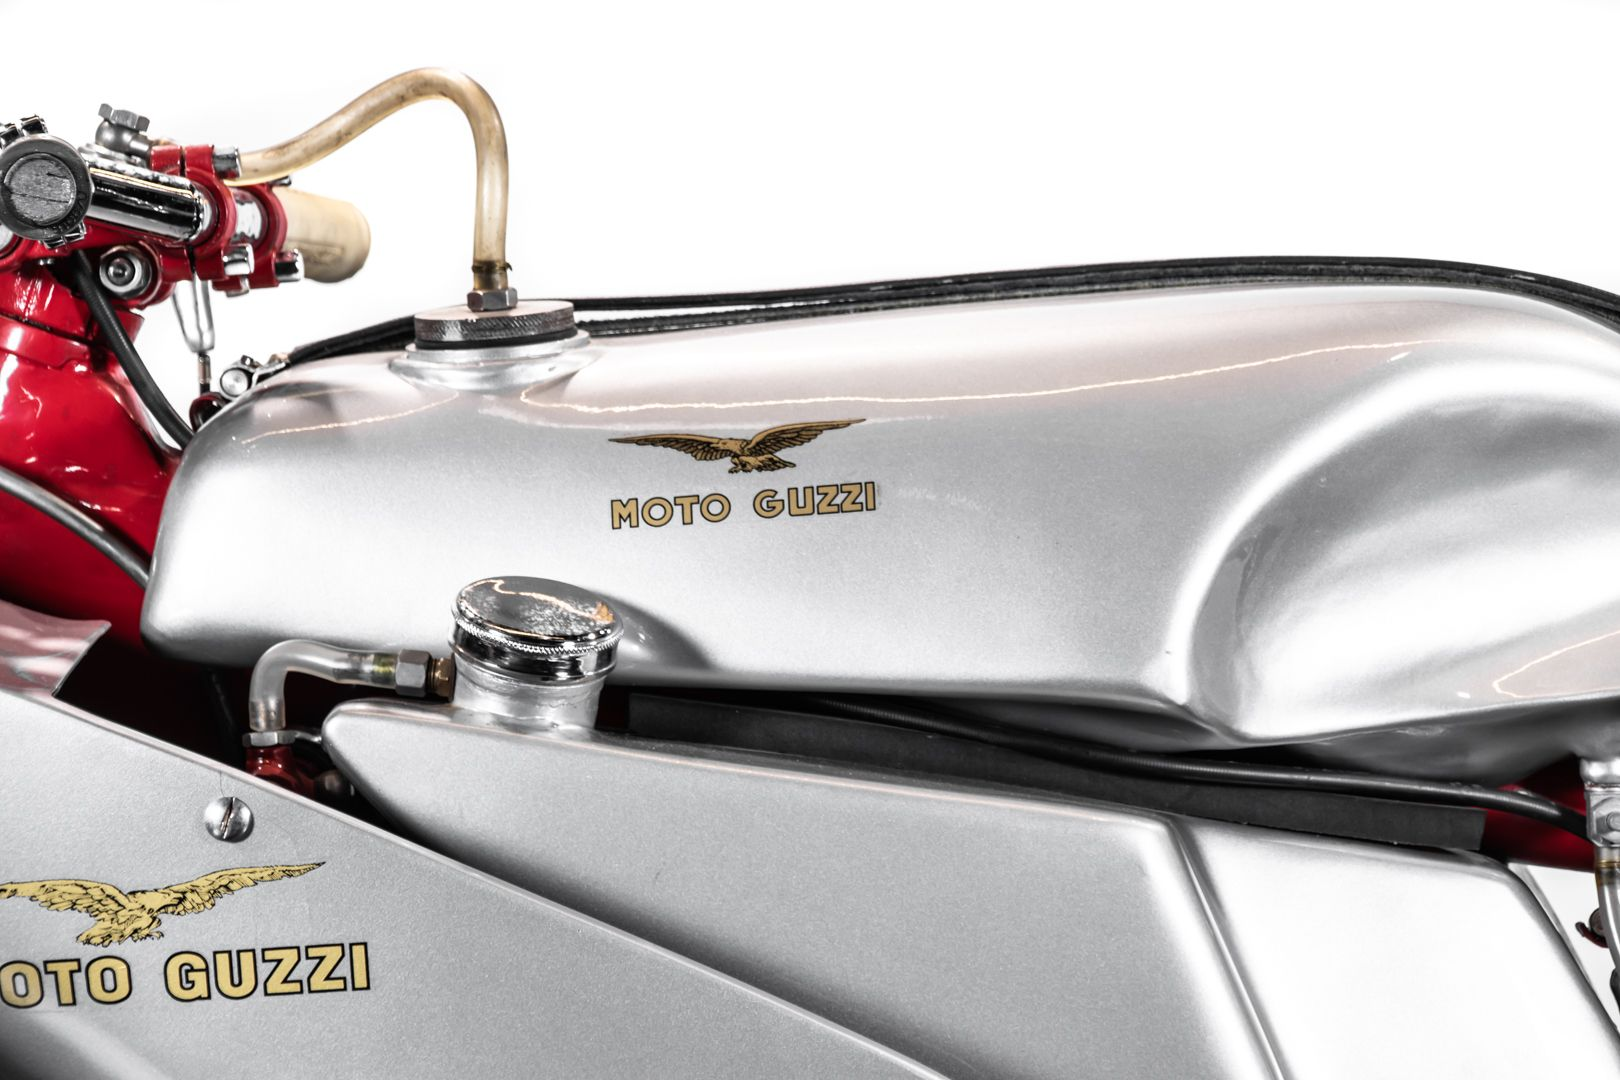 1930 Moto Guzzi 250 SS Corsa 77185